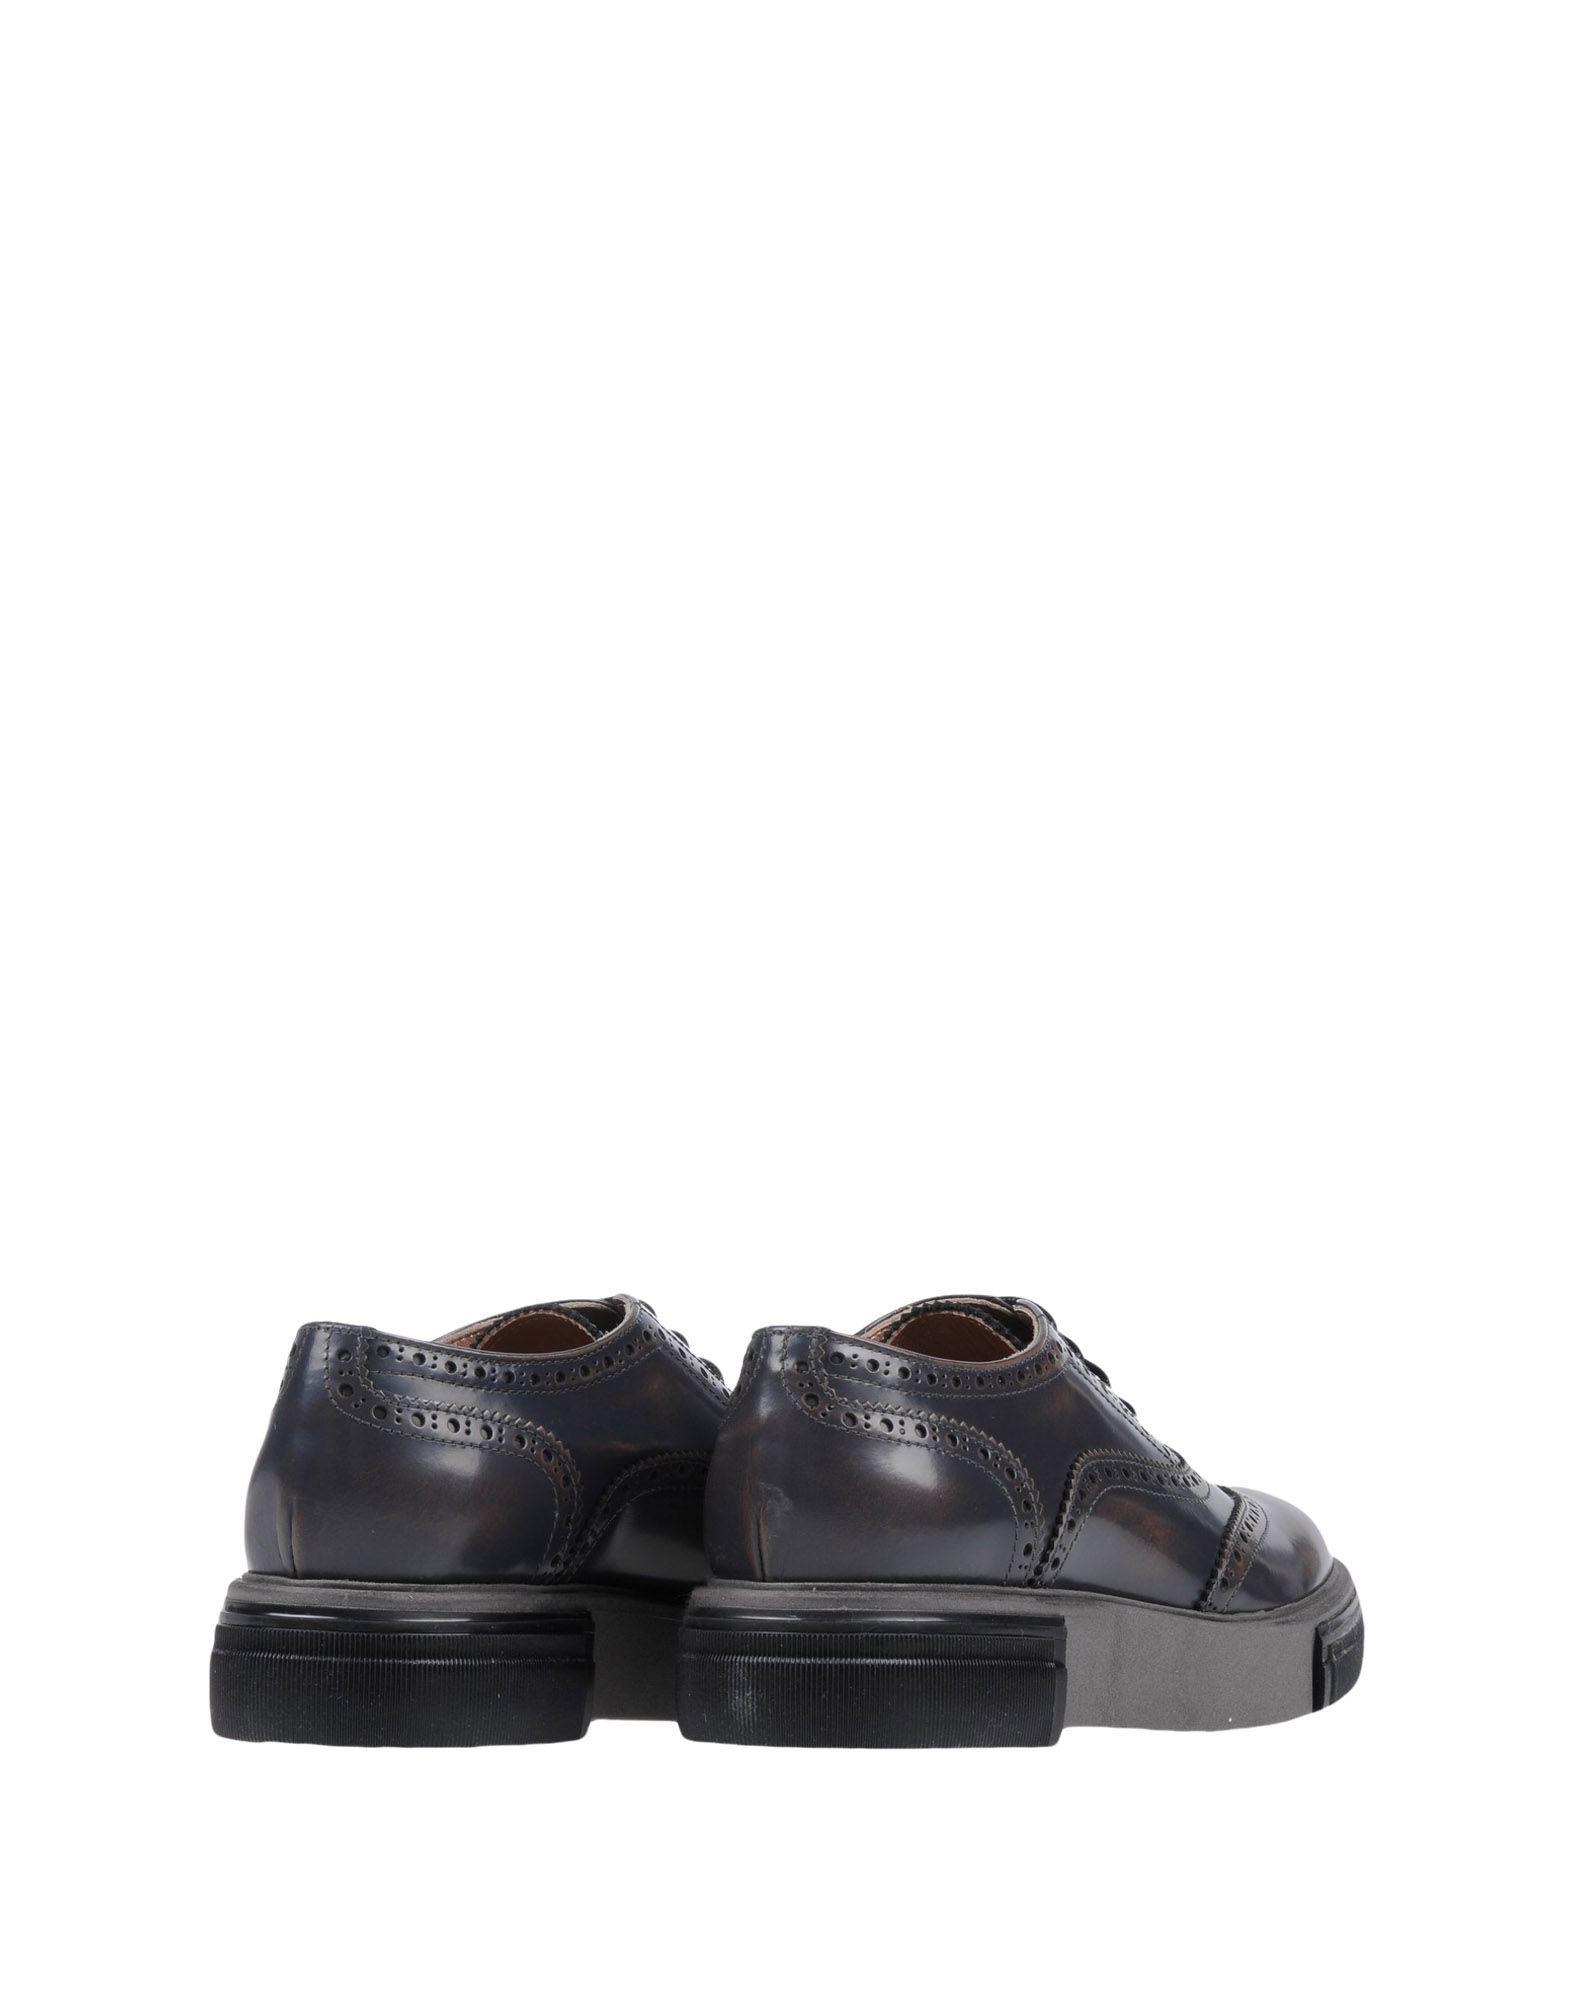 Pollini Schnürschuhe Schuhe Damen  11446915UH Heiße Schuhe Schnürschuhe 026b84